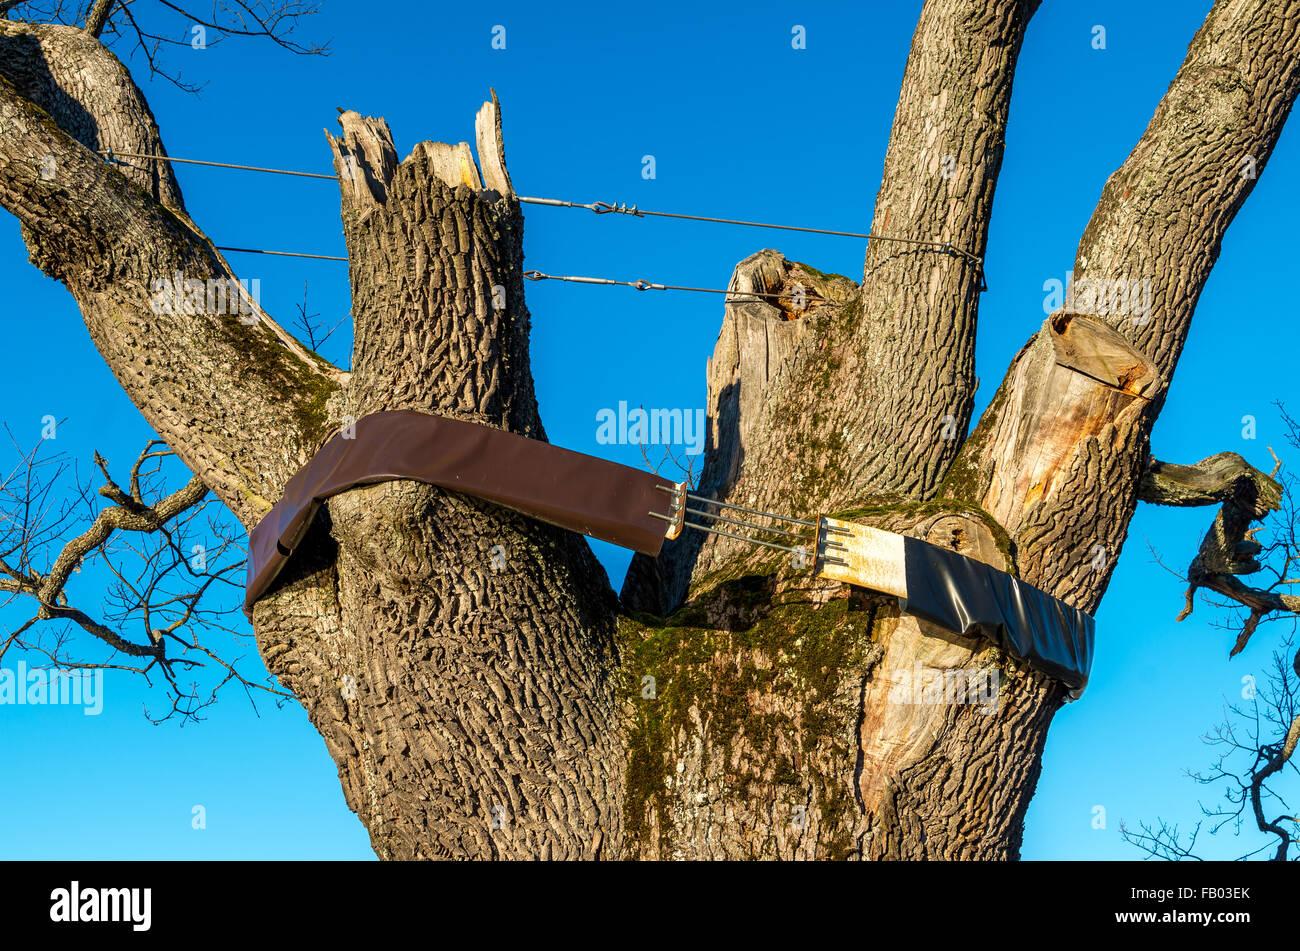 ancient oak tree at Pühajärve Estonia hold up with bandage - Stock Image